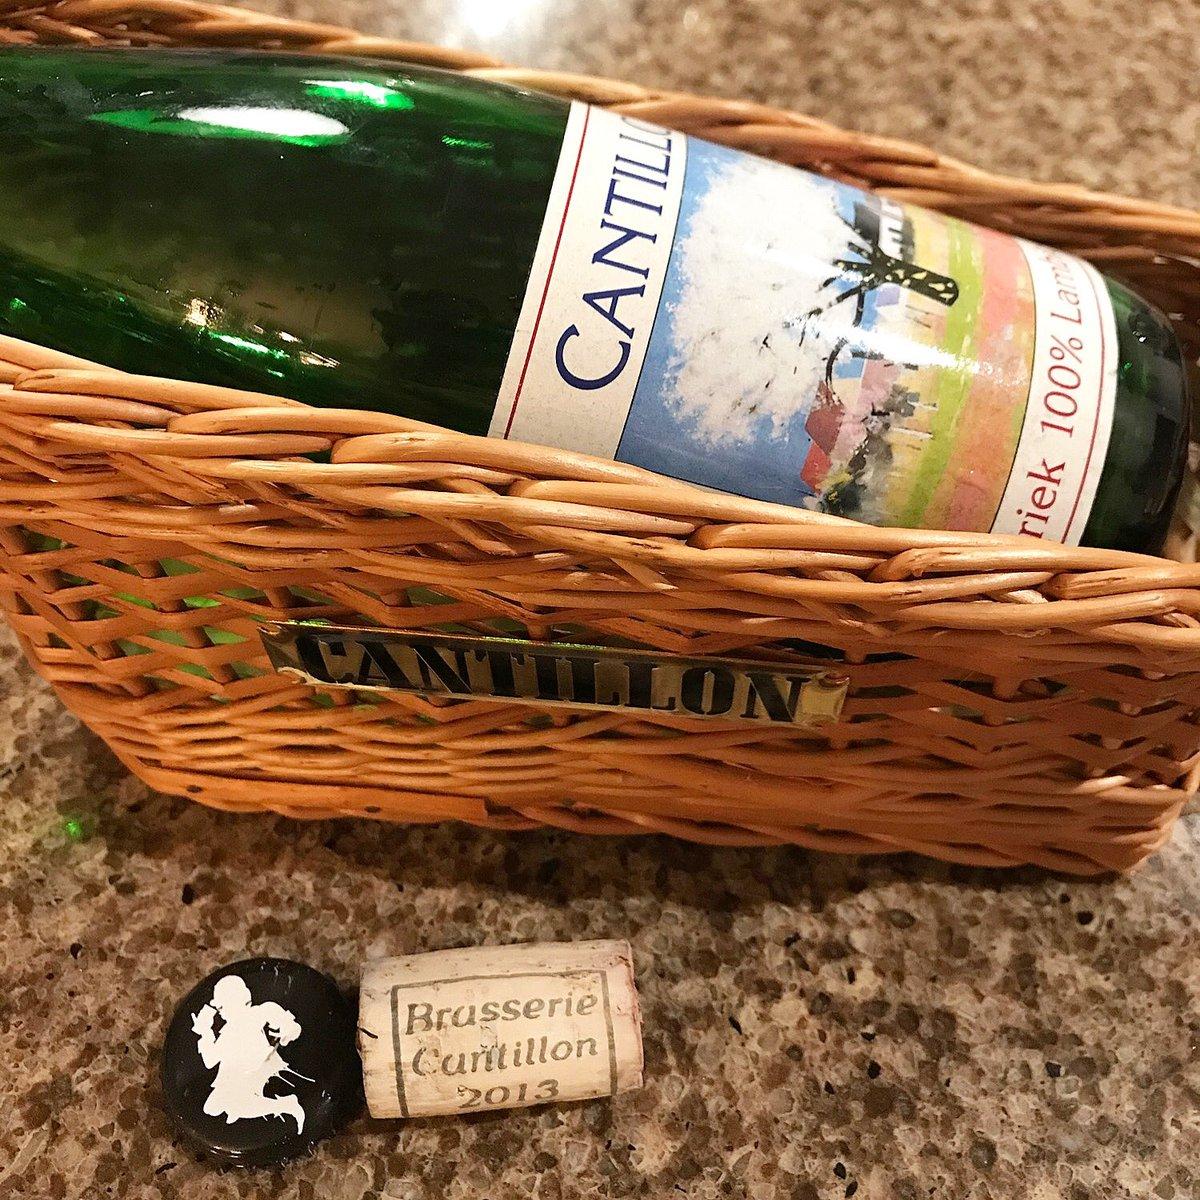 Pandemic rhymes with lambic soooooo #cantillon #2013 #kriek #lambic #beer #biere #belgique #belgique#Belgium #sour #beernerd #cerise #brewerycantillon #brasseriecantillonpic.twitter.com/kSEaxQpLn5